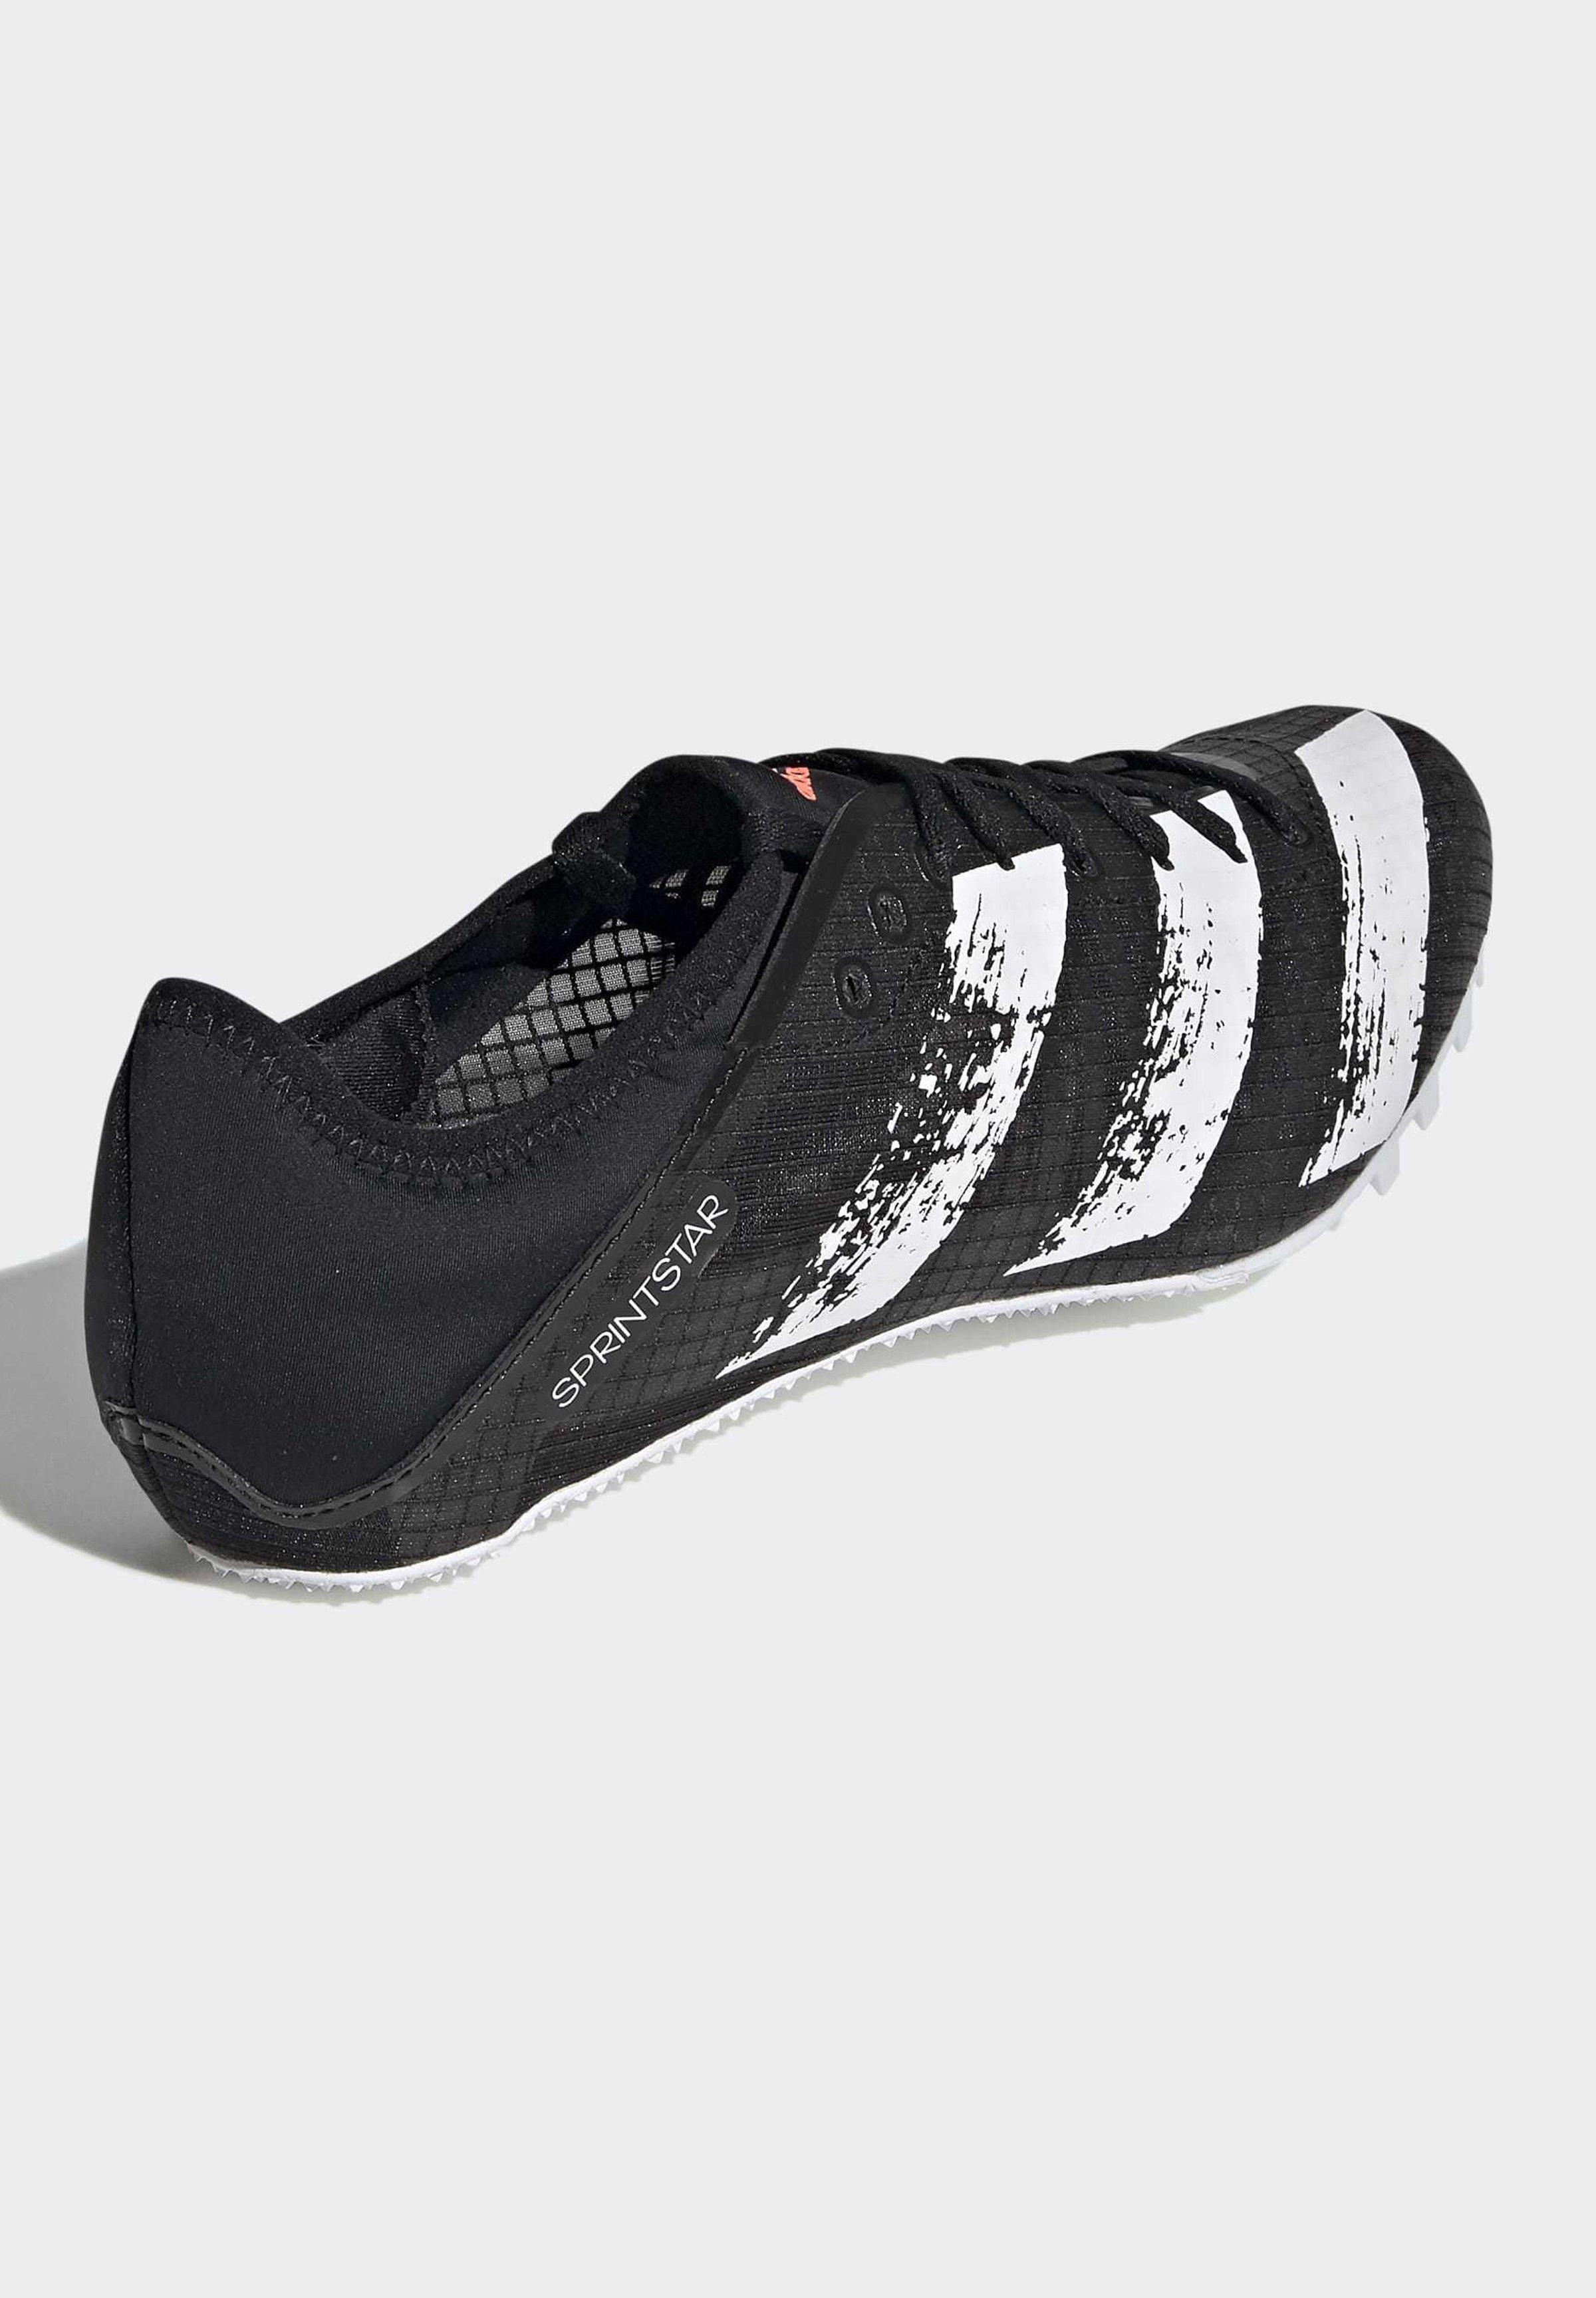 Adidas Performance Hardloopschoenen Neutraal - Black Goedkope Schoenen